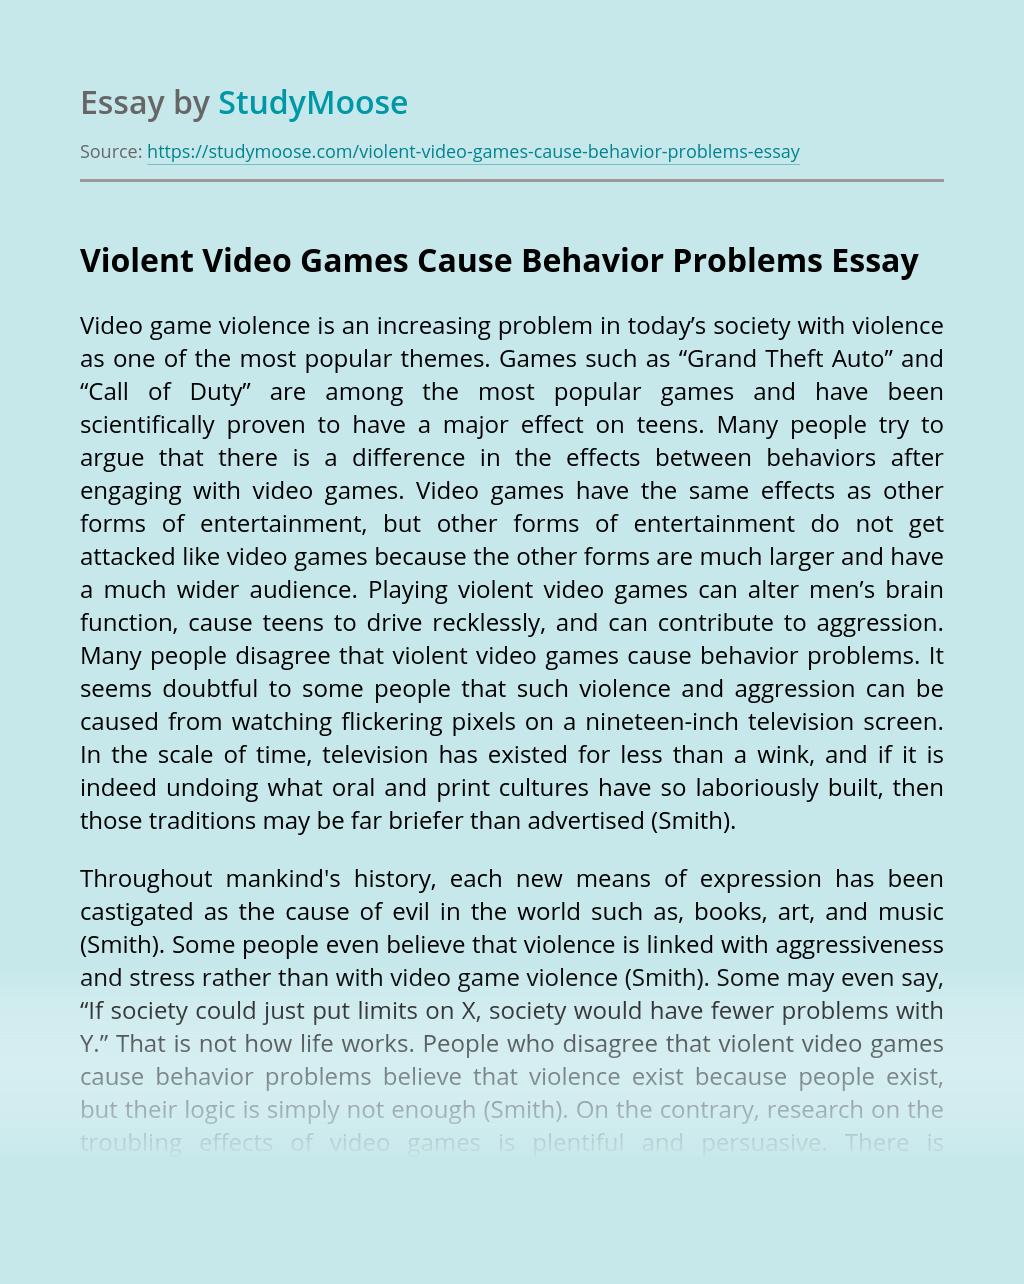 Essay about violent video games